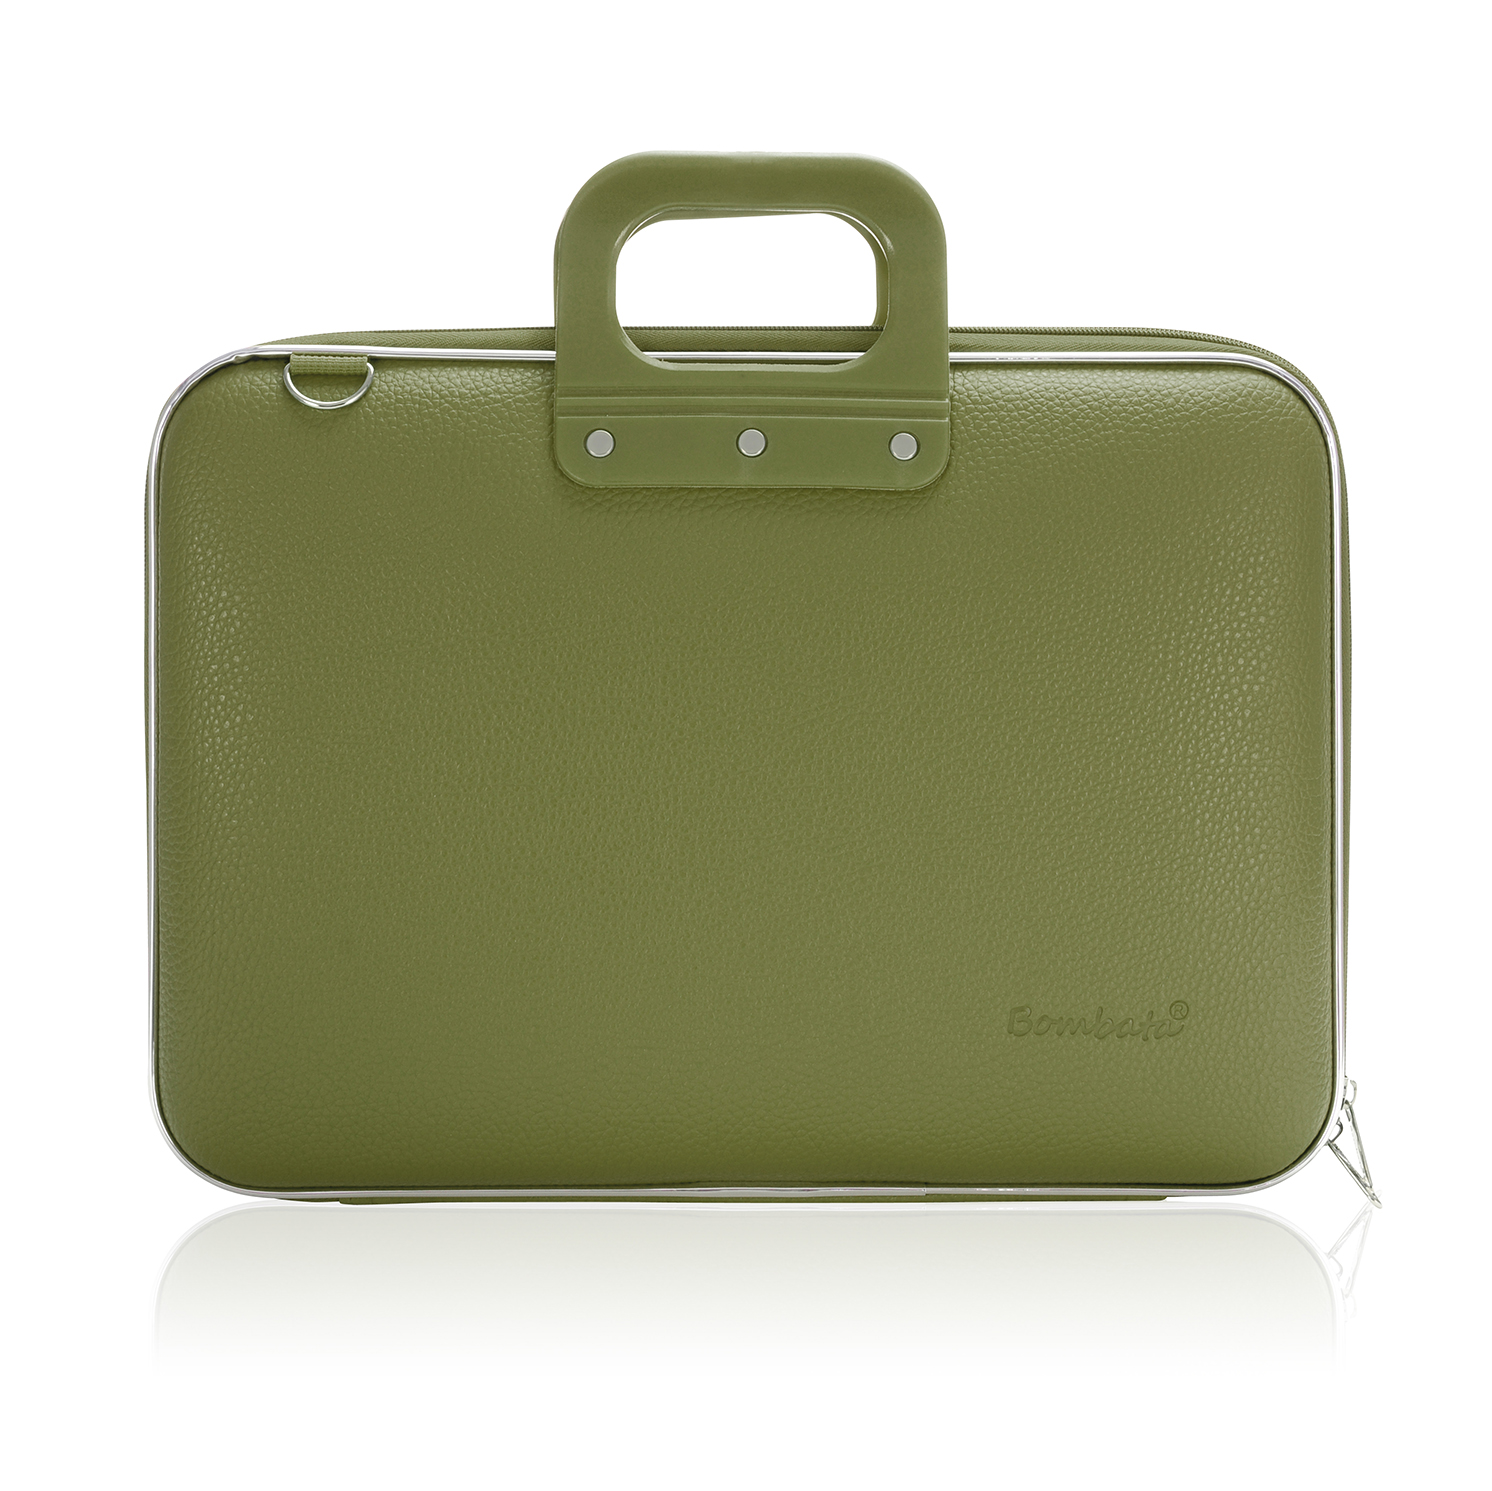 Bombata – Khaki Classic 15″ Laptop Case/Bag with Shoulder Strap